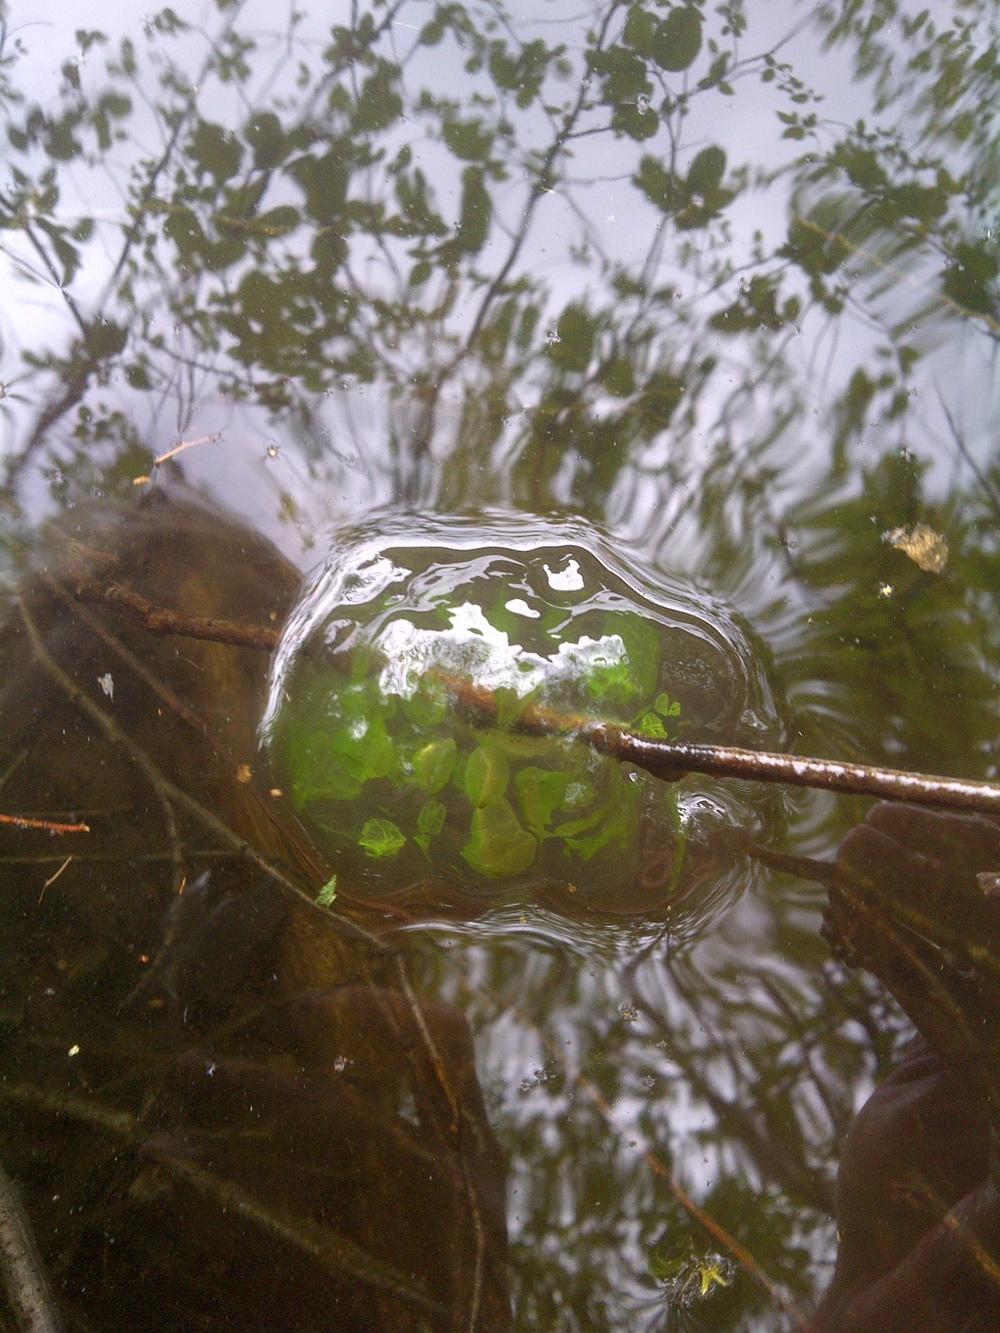 Squamish-Lillooet D-20110531-00066.jpg